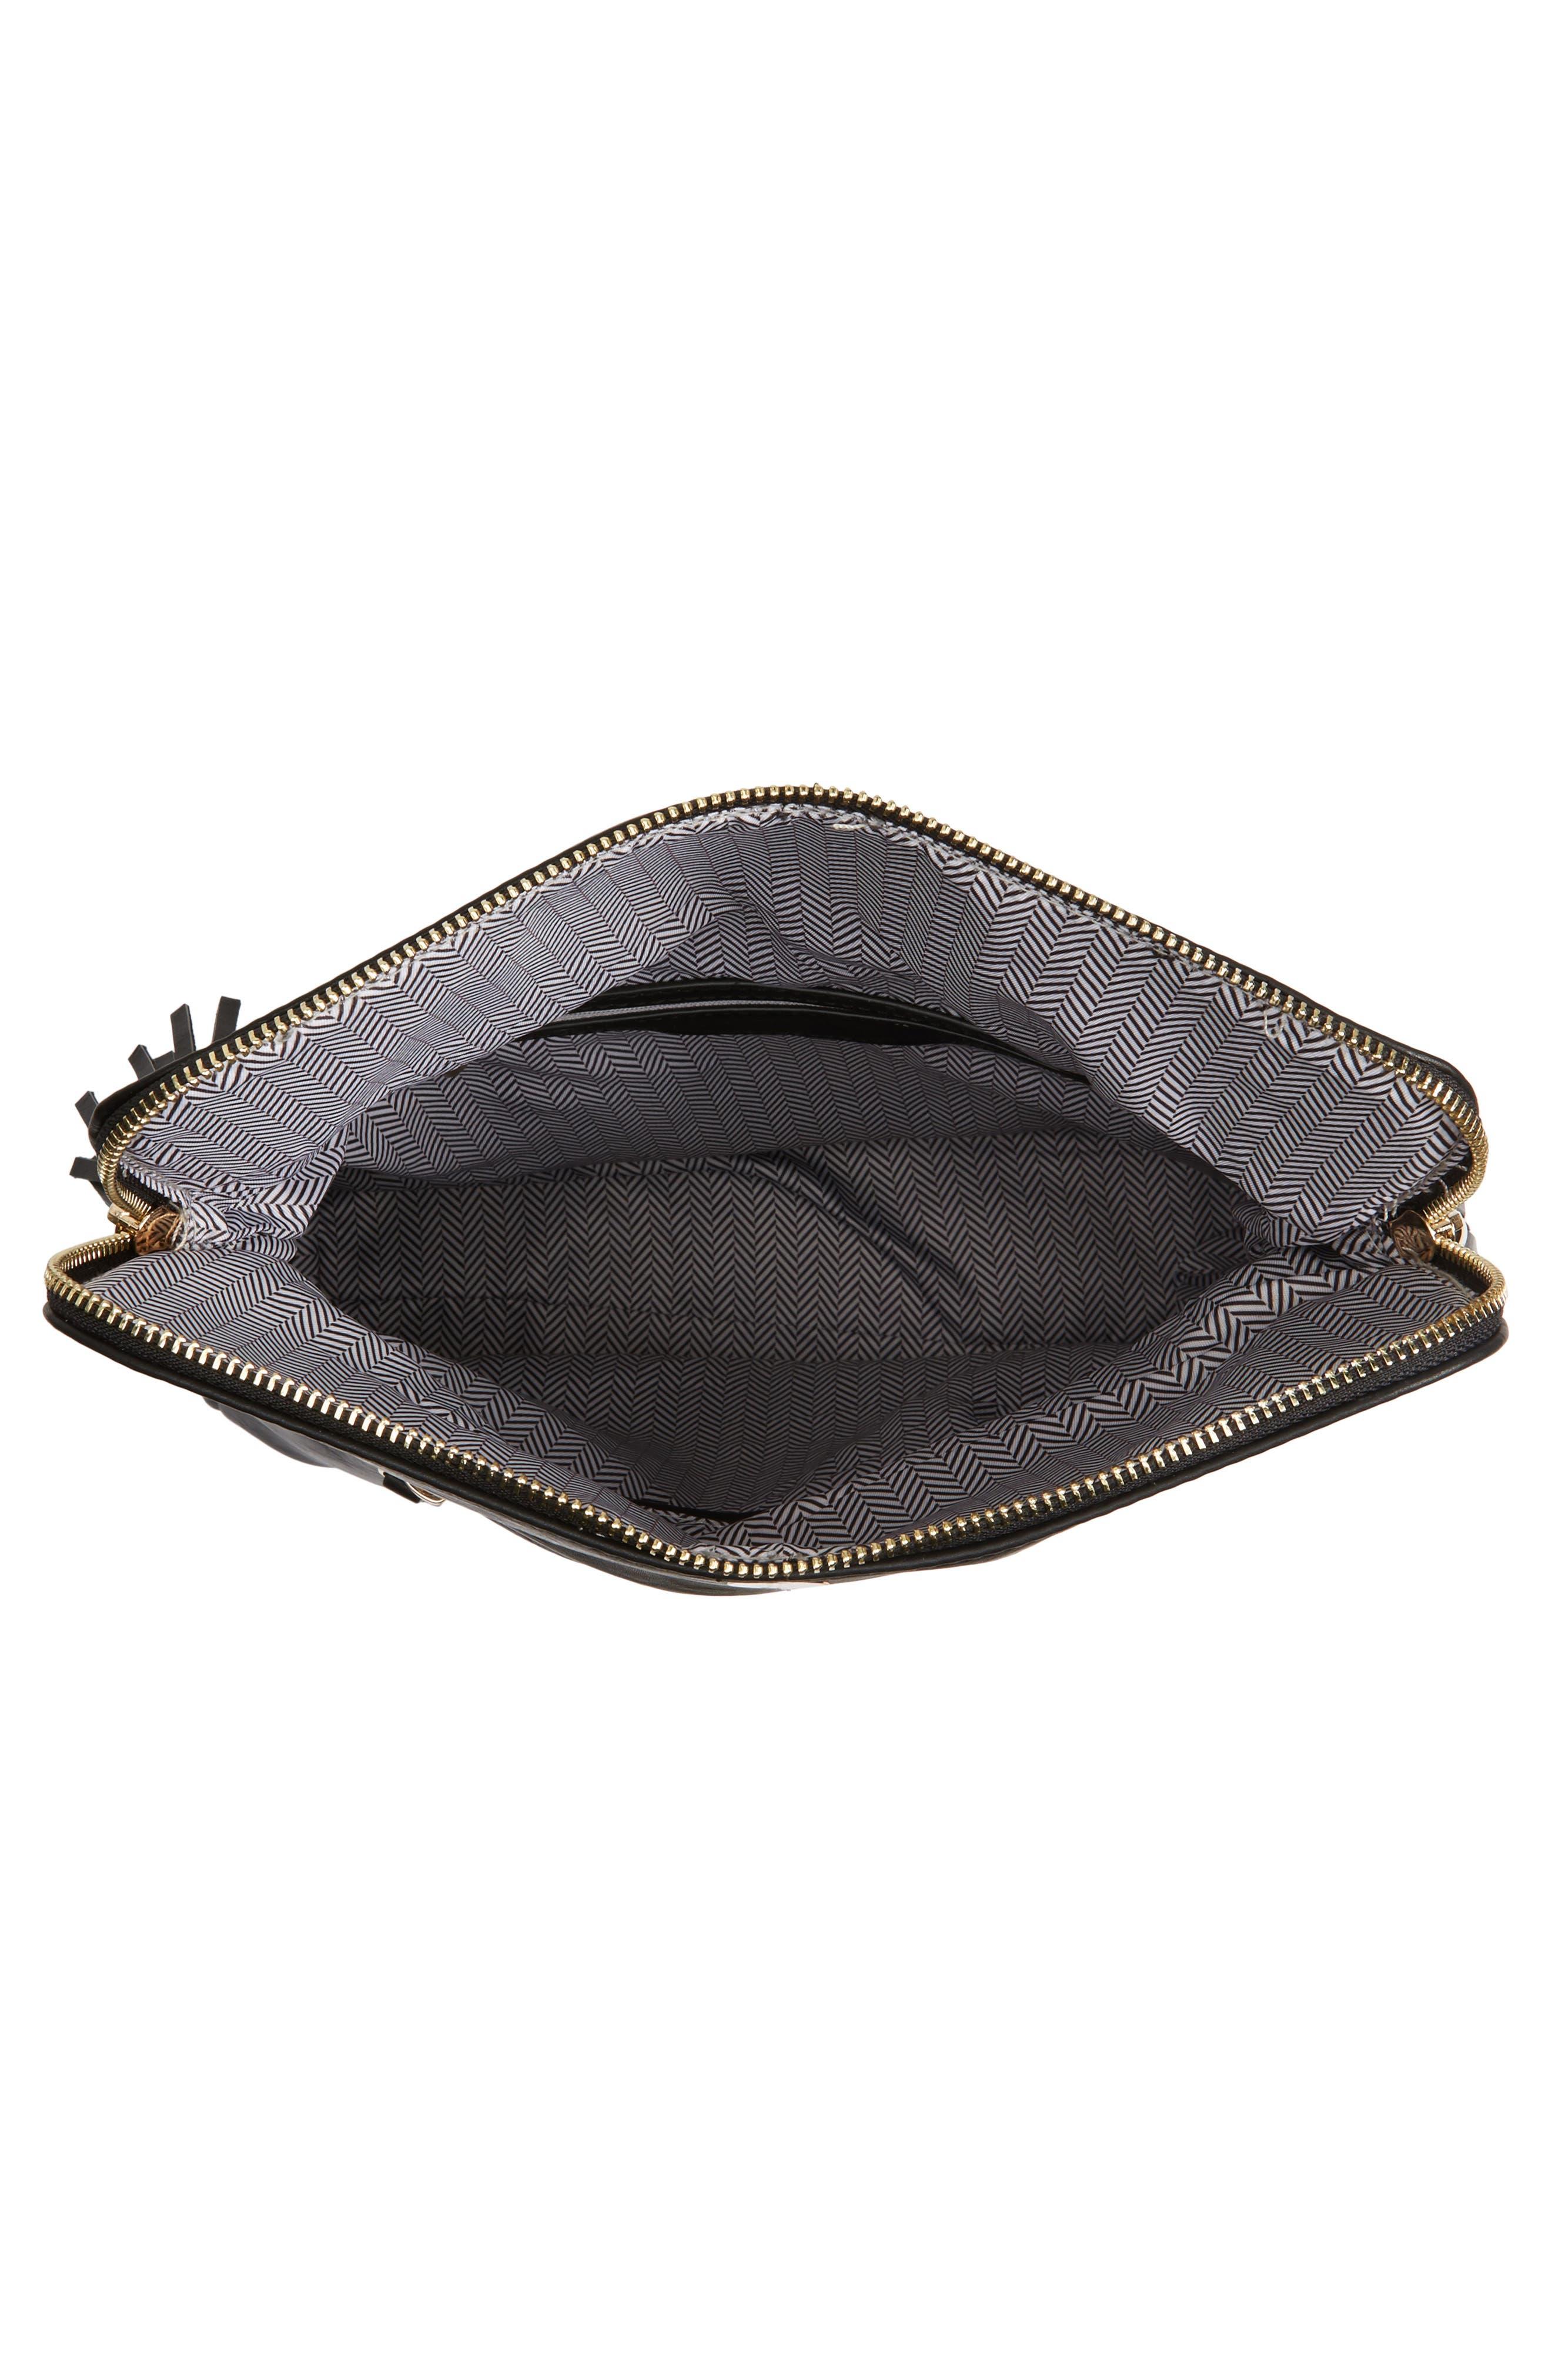 Foldover Crossbody Bag,                             Alternate thumbnail 5, color,                             001